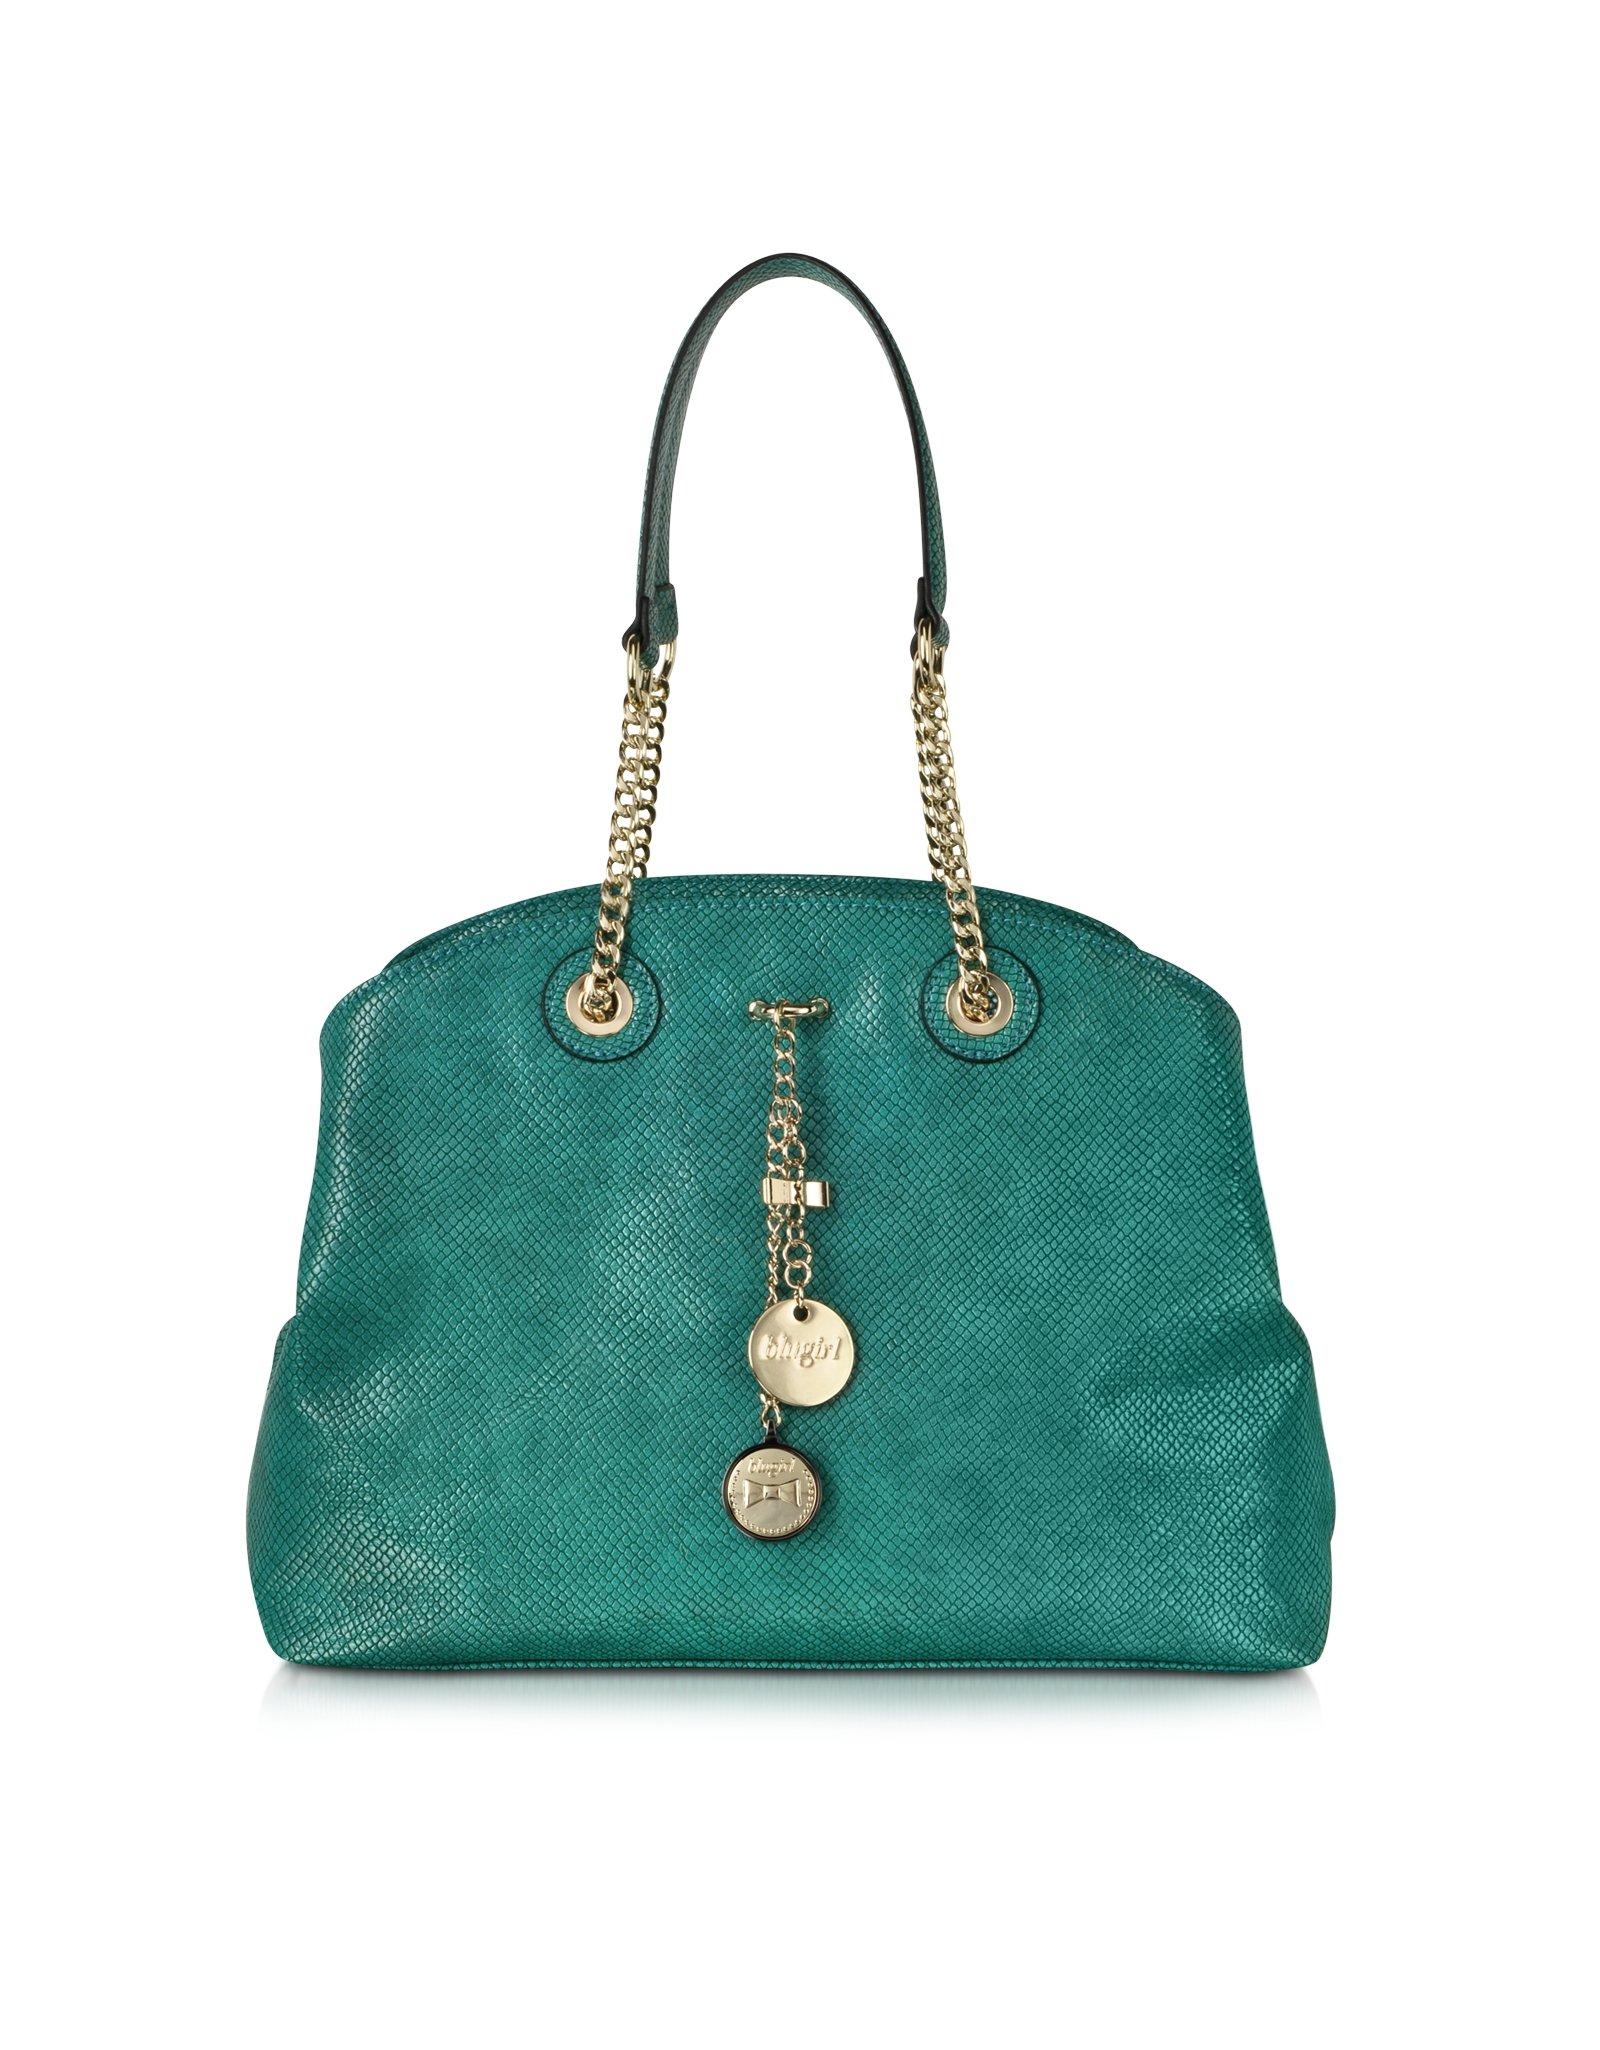 Blugirl Blumarine Emerald Green Lizard Stamped Eco Leather Shoulder ... a3bbf233e3